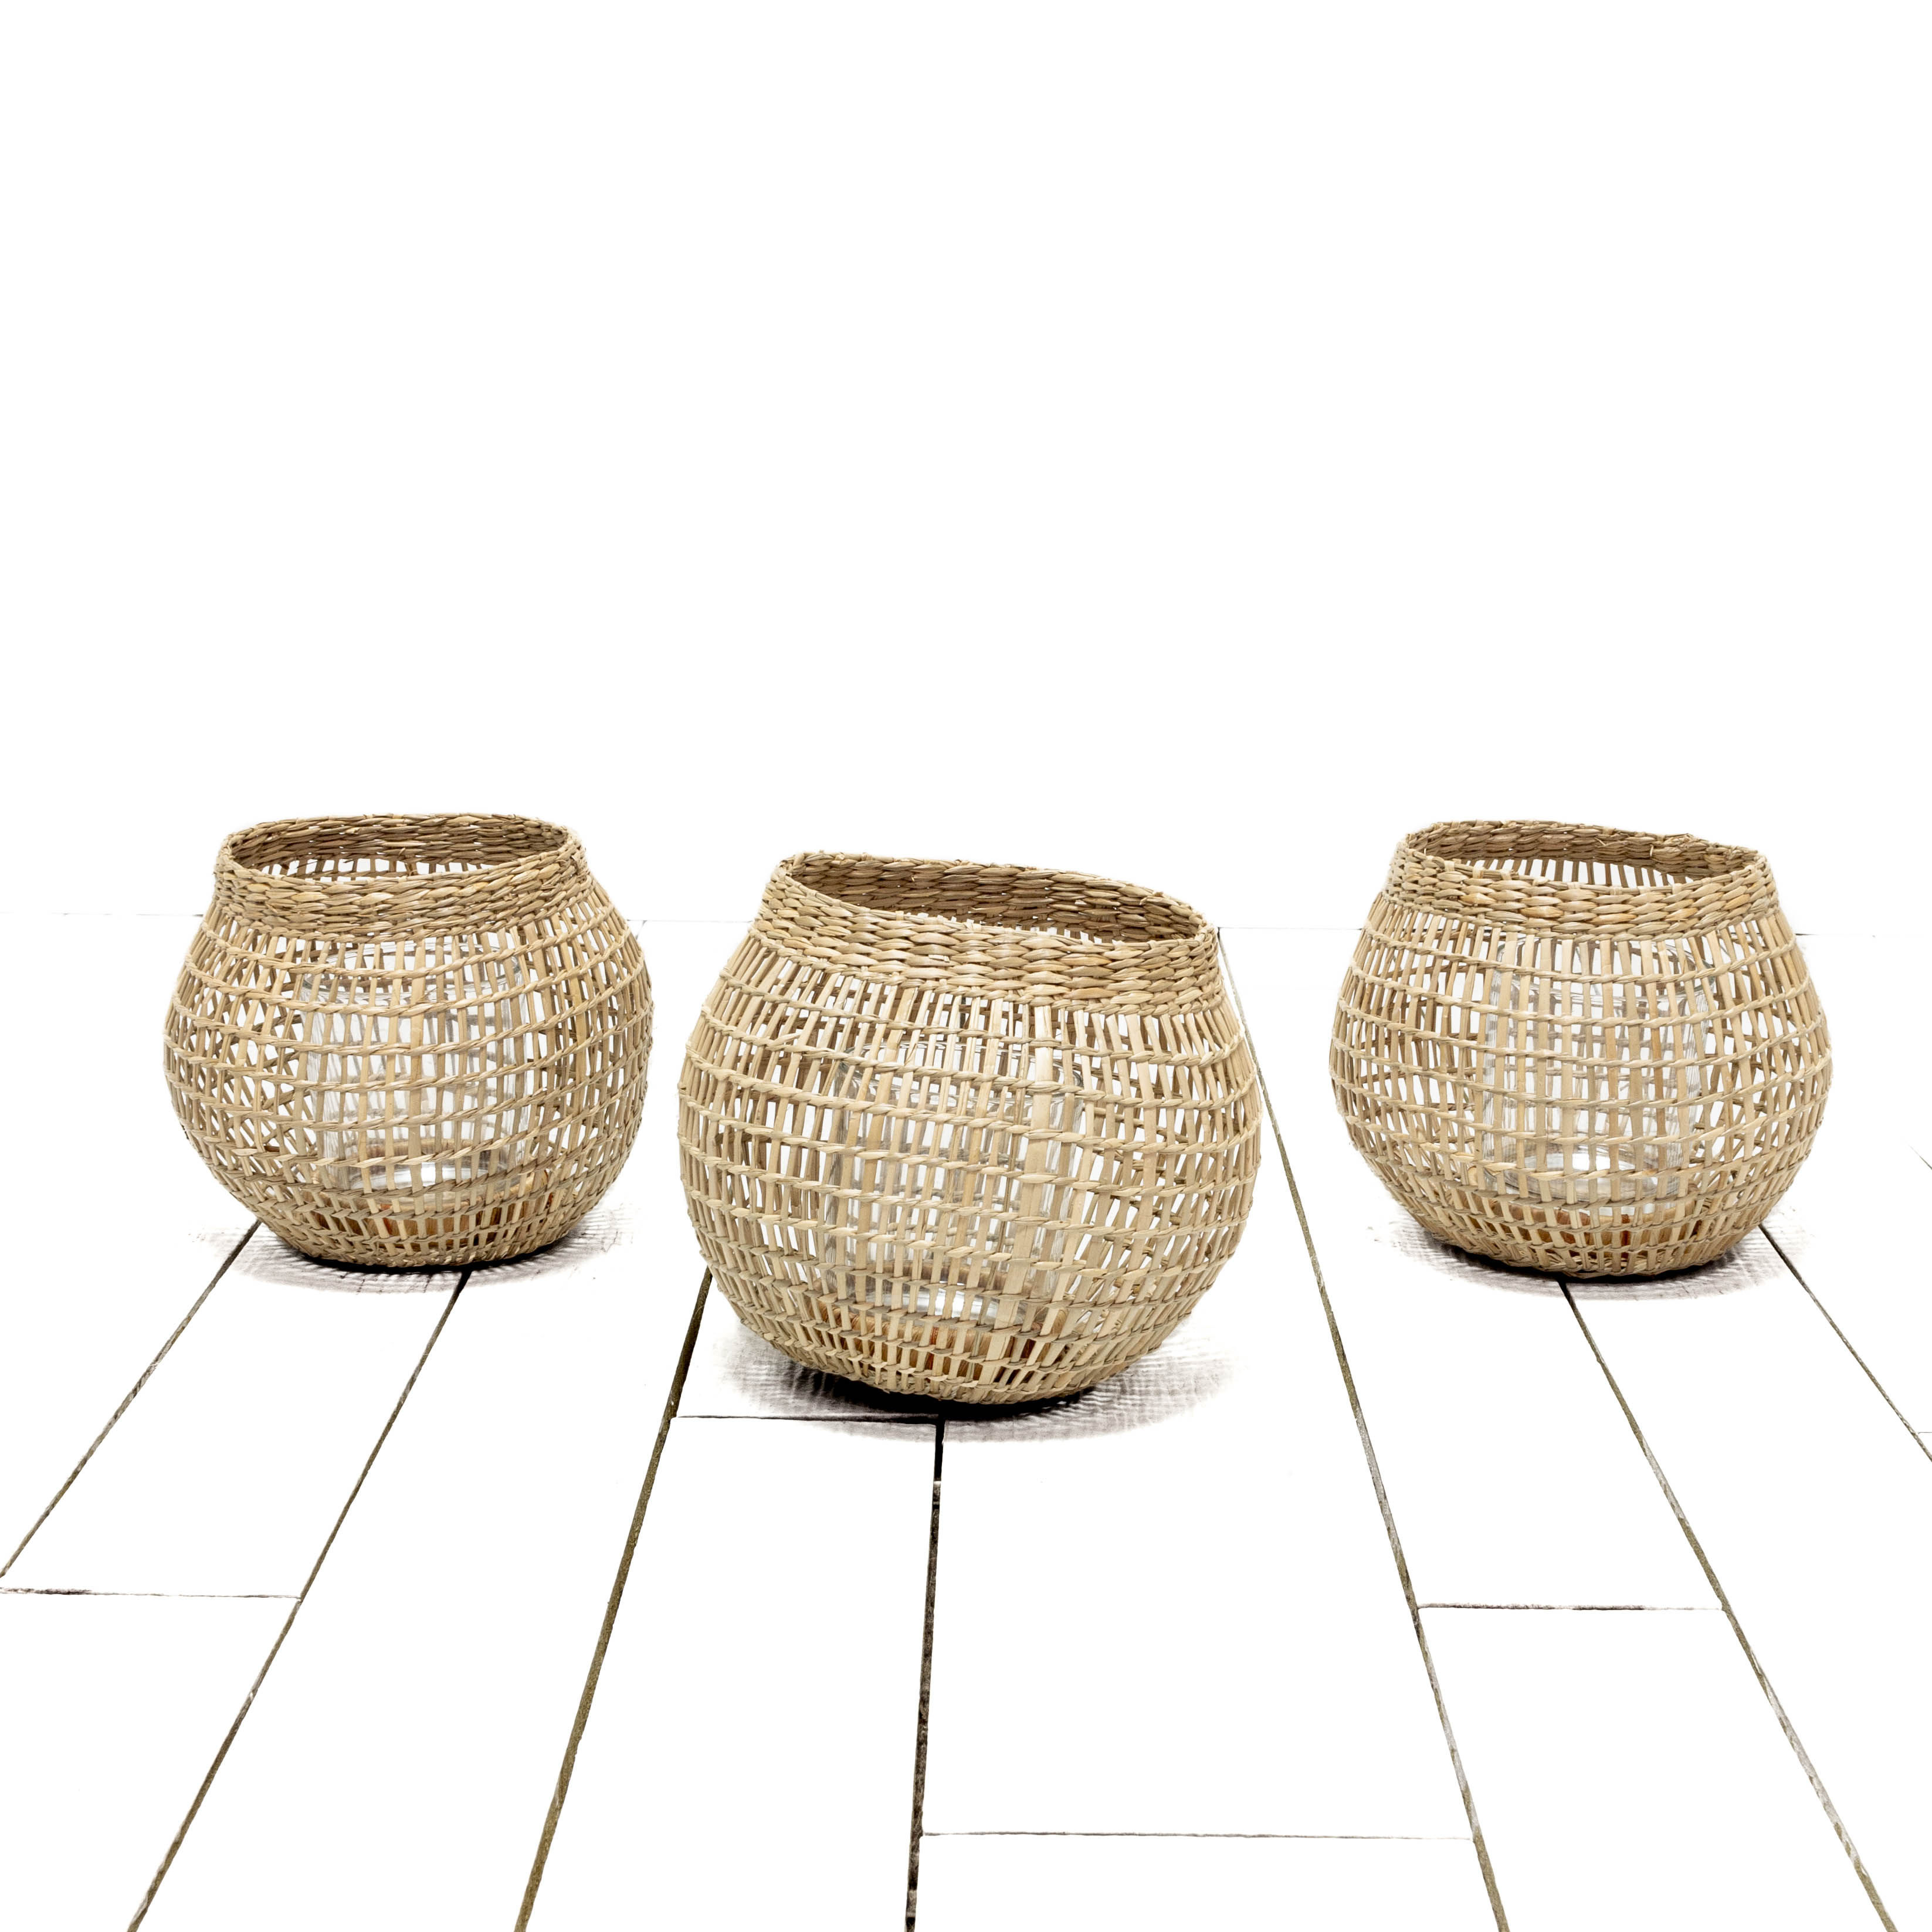 Seagrass Lanterns - Small